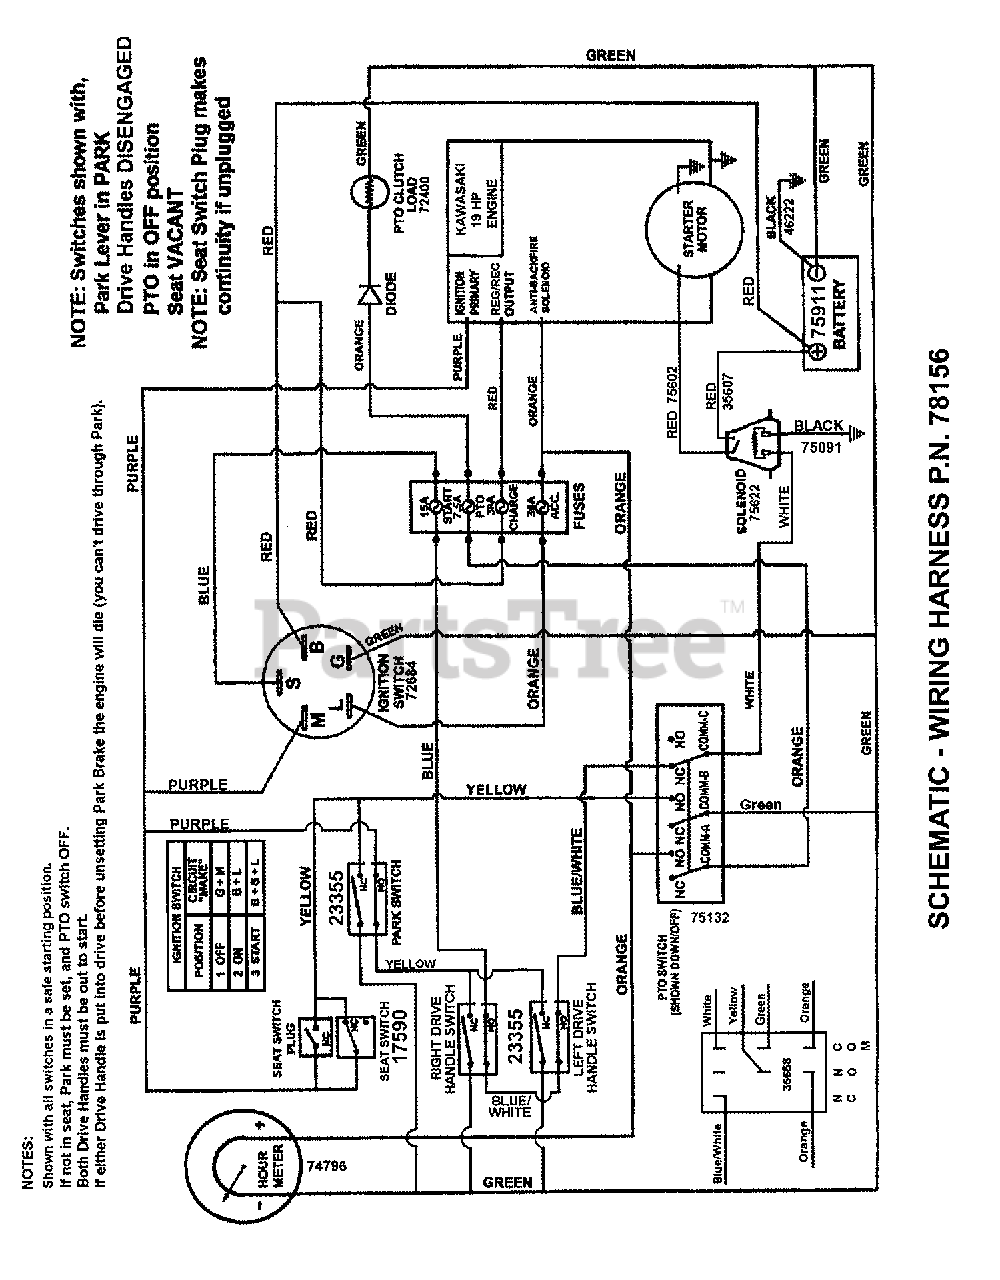 snapper mower wiring harness snapper czt 19480kwv  85672  snapper 48  zero turn mower  19hp  zero turn mower  19hp